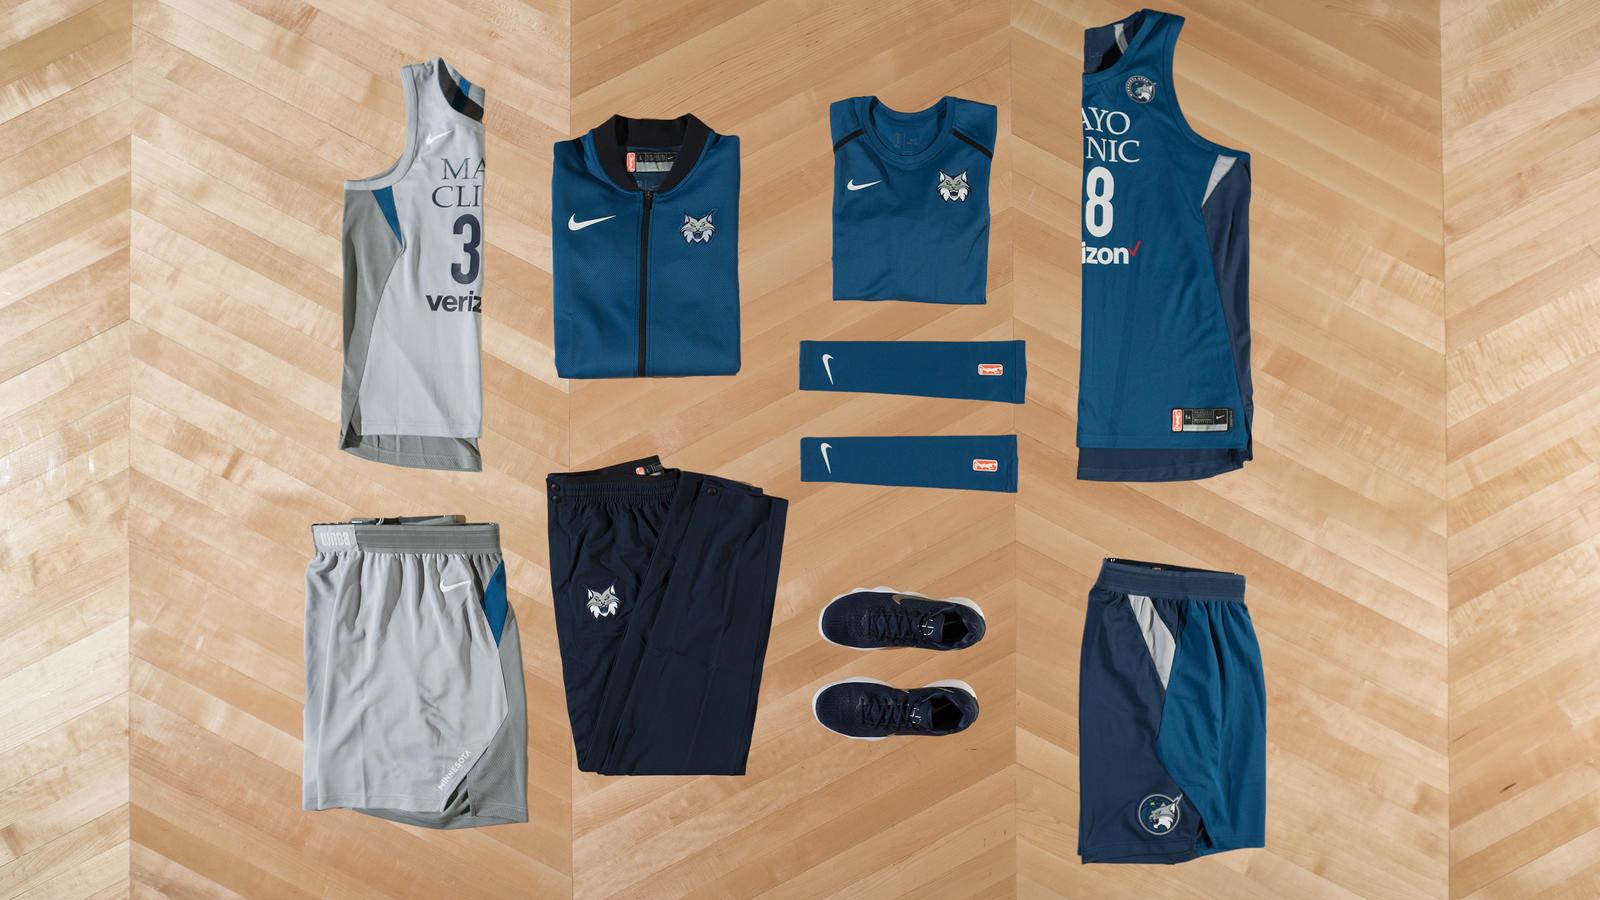 Nike's WNBA Uniforms are Built